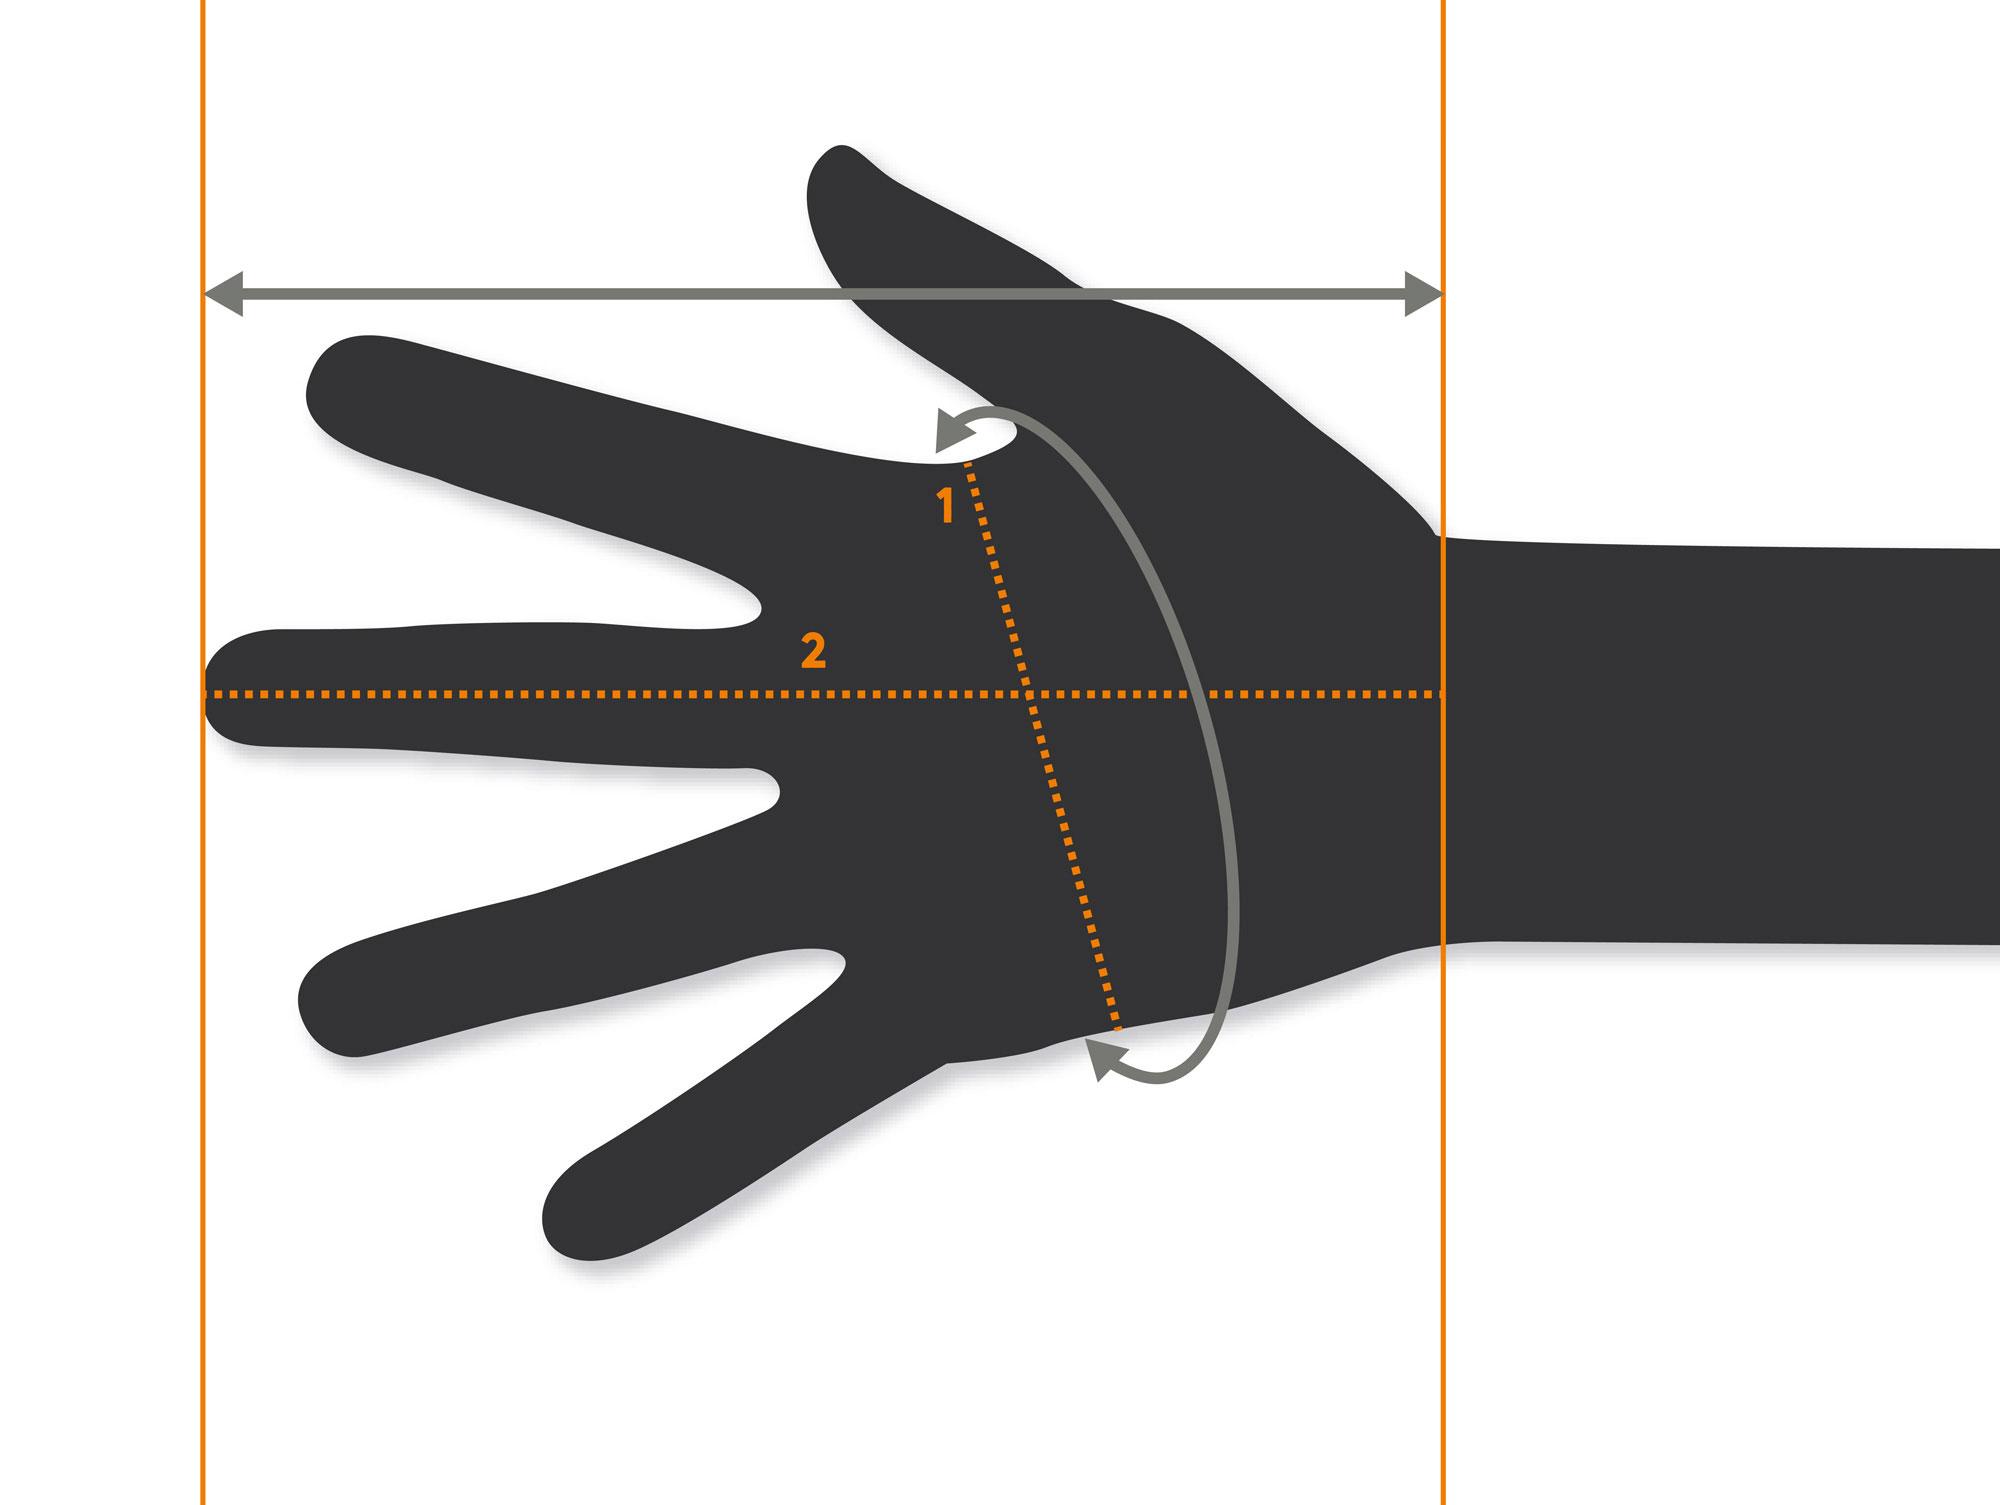 Hestra Size Chart 1 Hand Cirference Mm 2 Lenght Men Women Kids